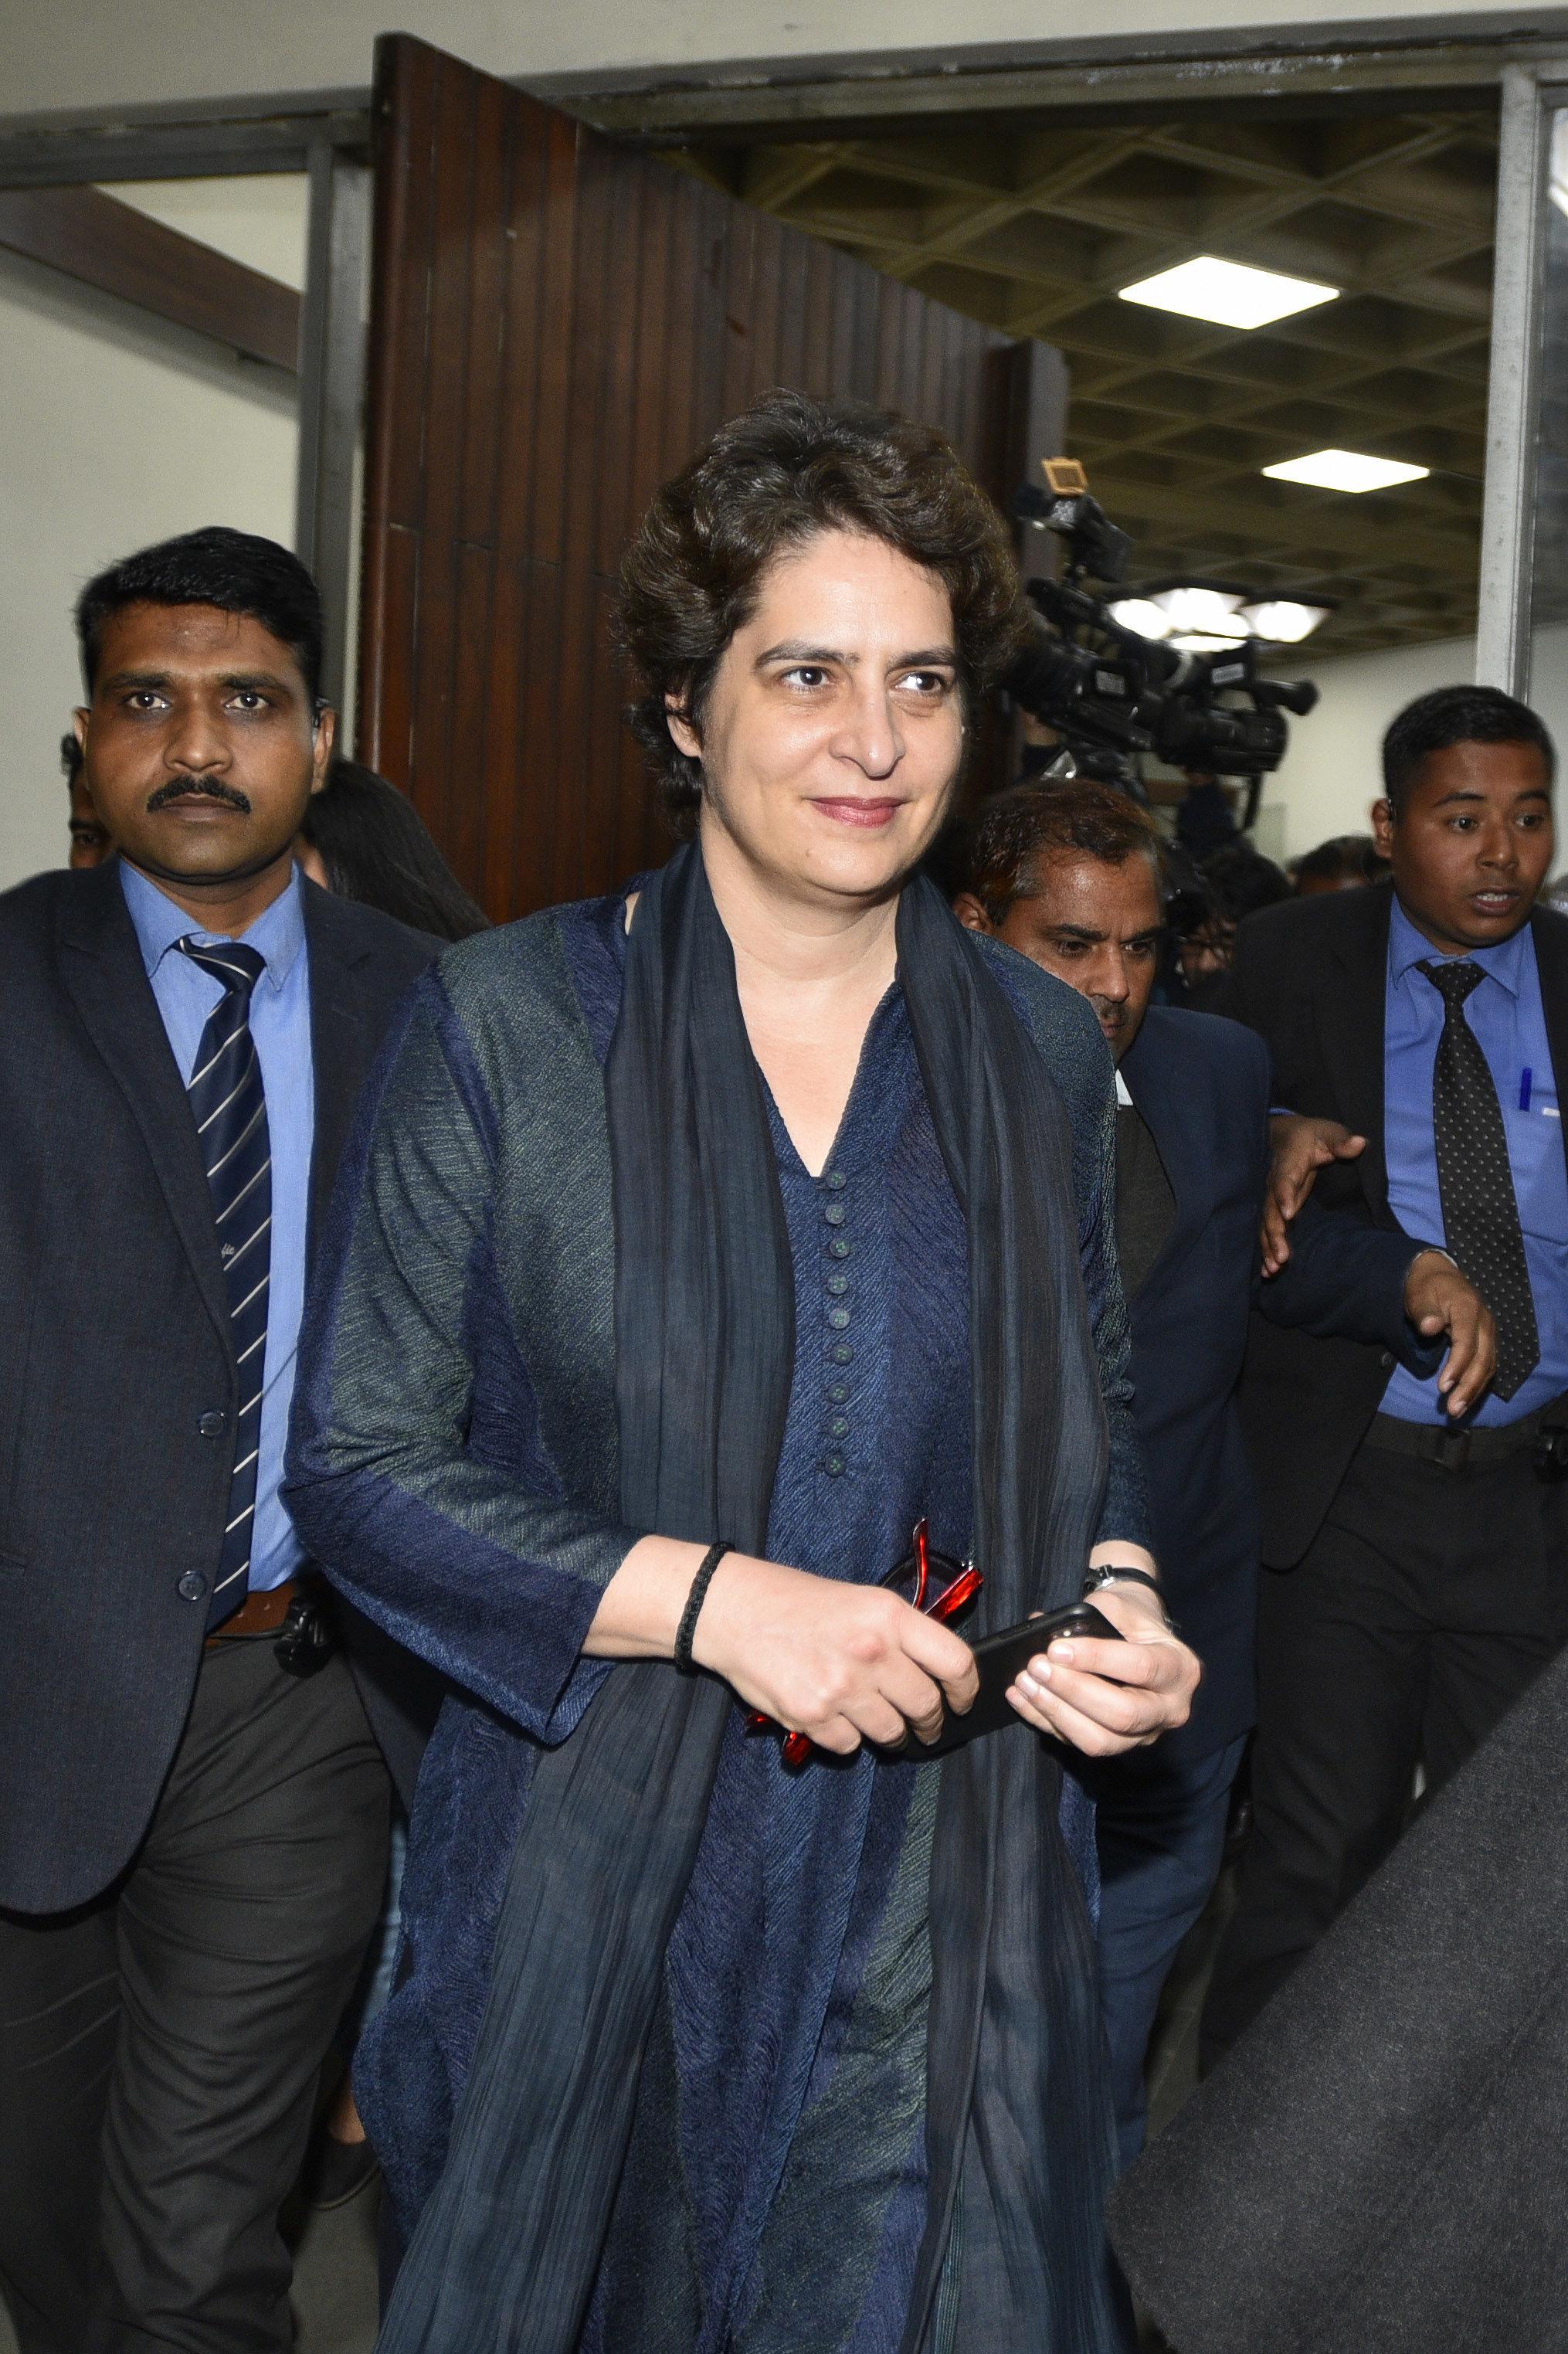 'Priyanka Gandhi Wears Jeans In Delhi, But Sarees In UP': BJP's Sexist Attacks